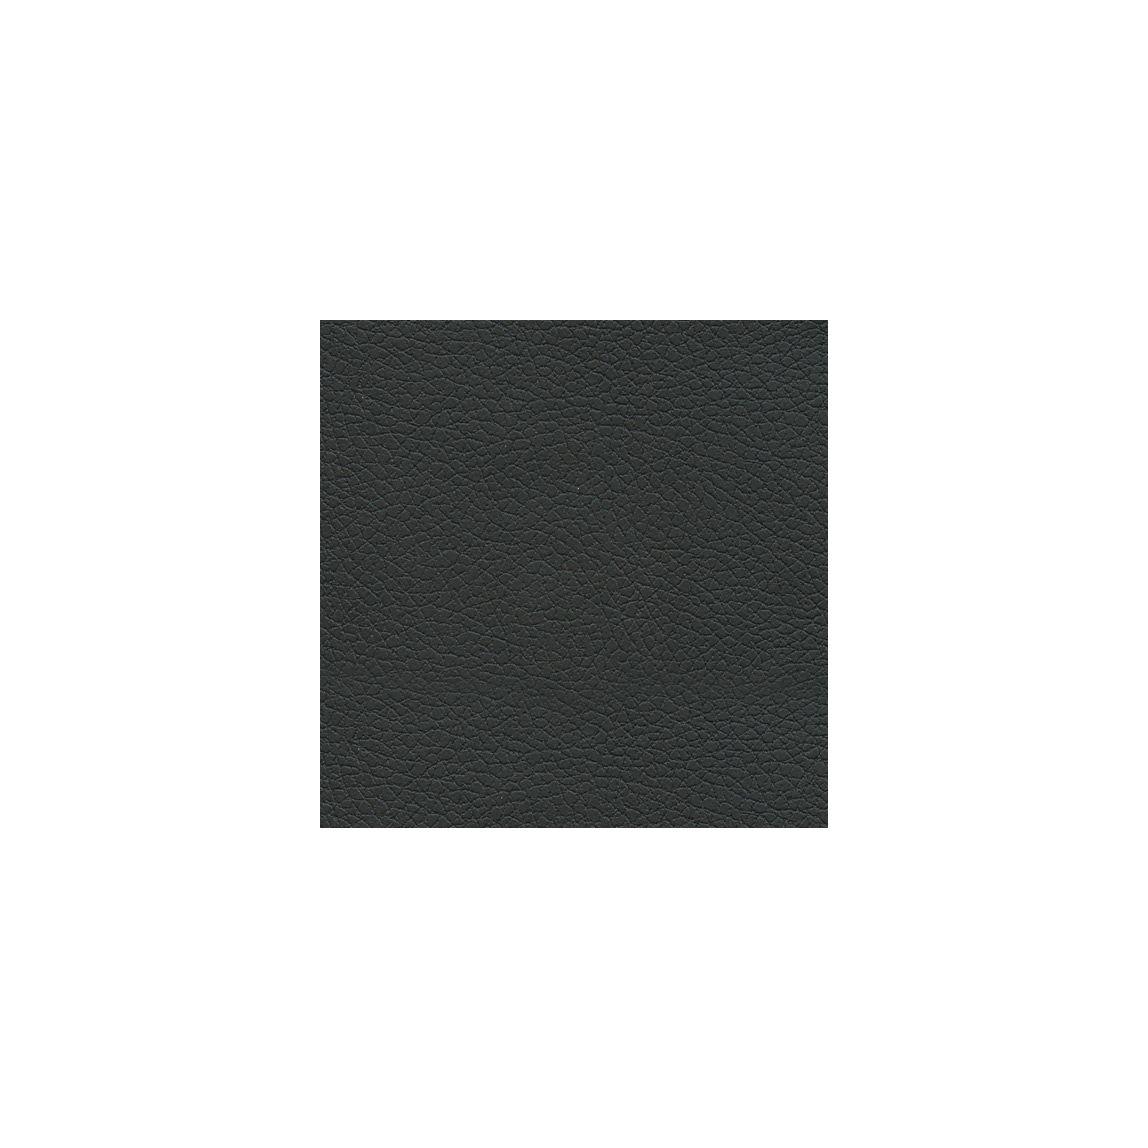 Brisa Black Onyx Swatch